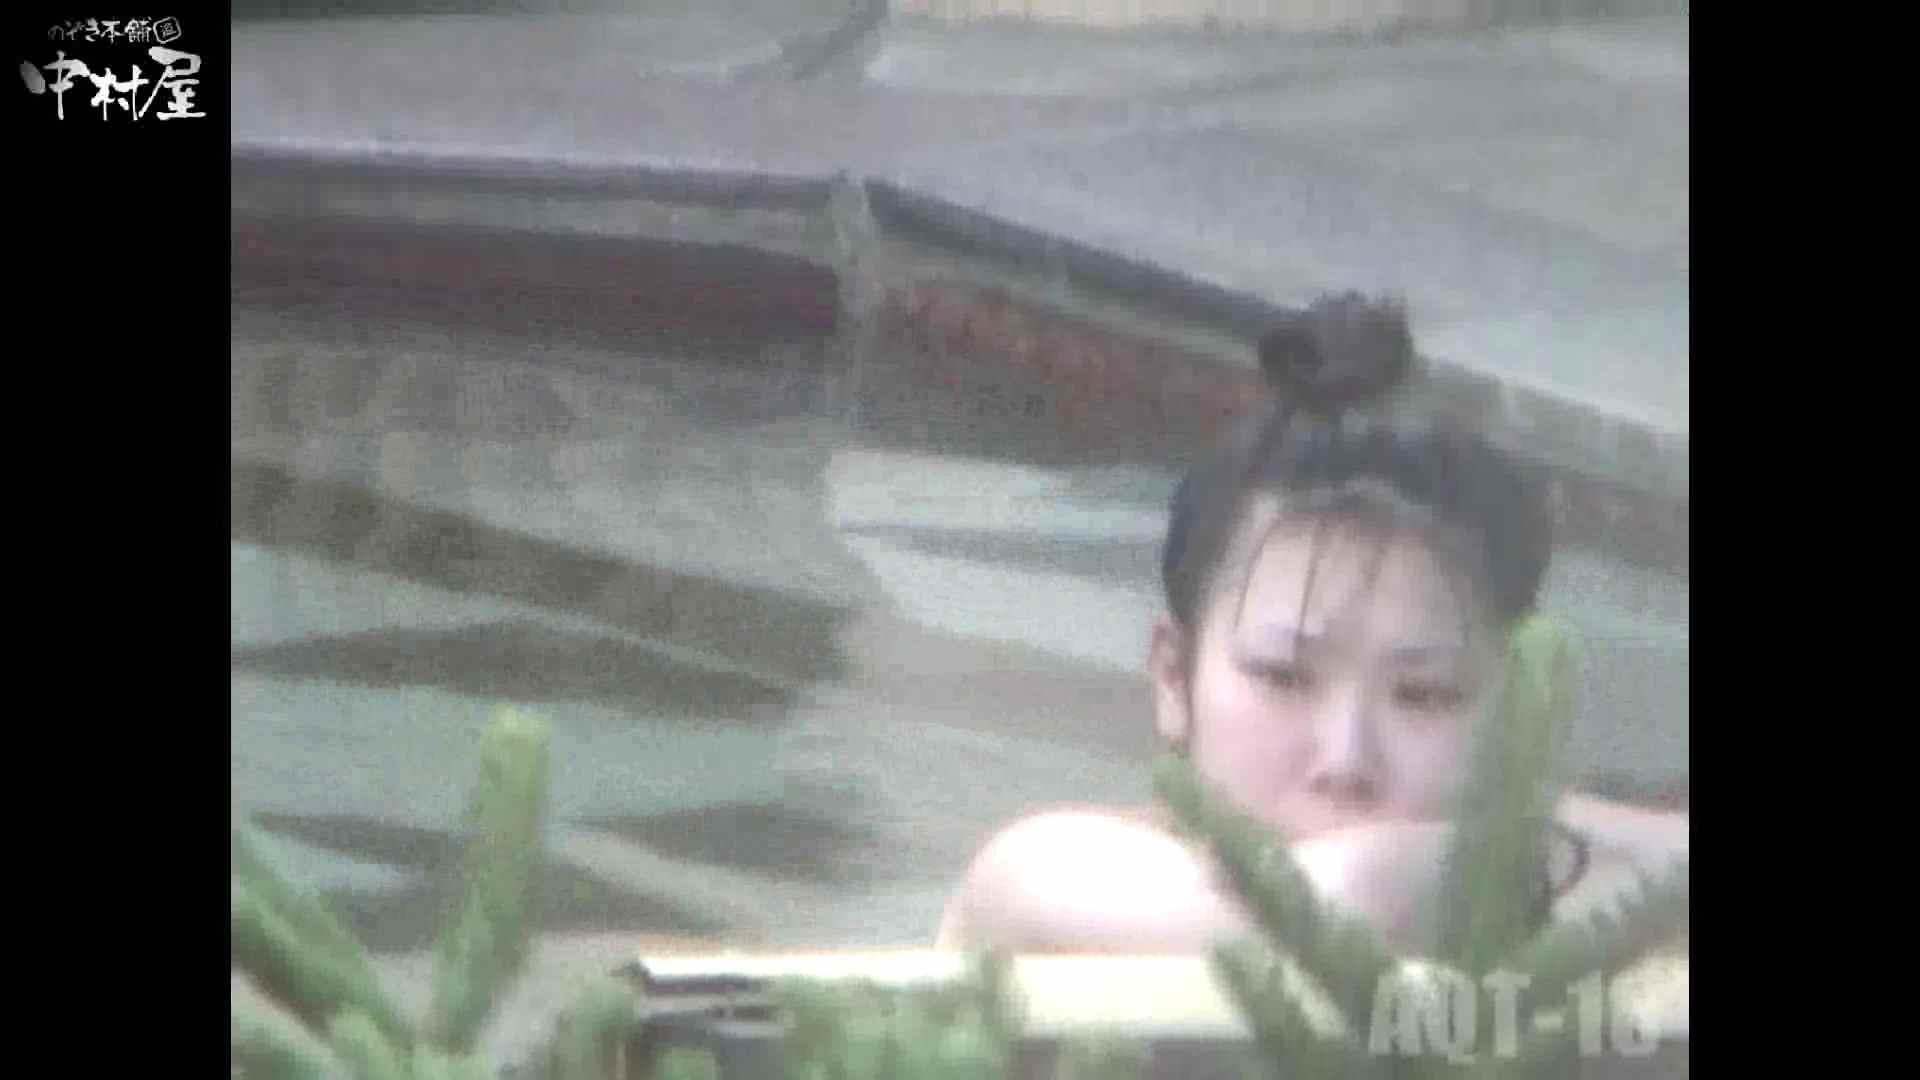 Aquaな露天風呂Vol.882潜入盗撮露天風呂十八判湯 其の二 OLエロ画像 覗きスケベ動画紹介 78PICs 78